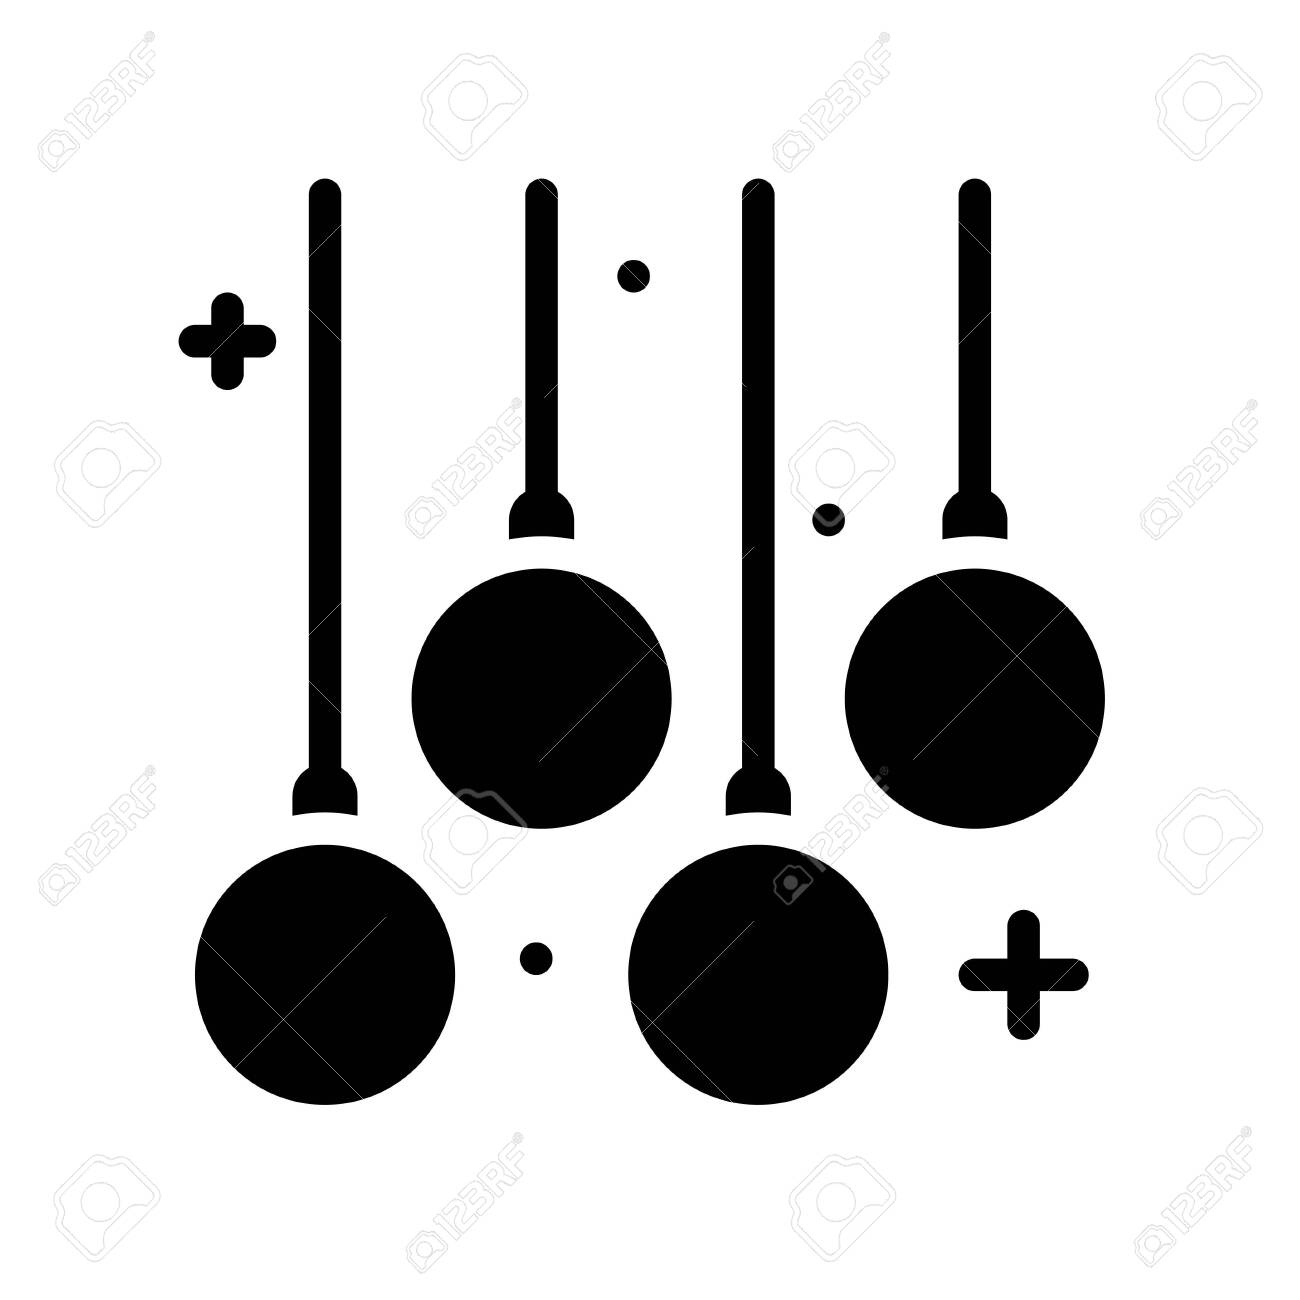 Christmas lights solid design icon, vector illustration - 136139991